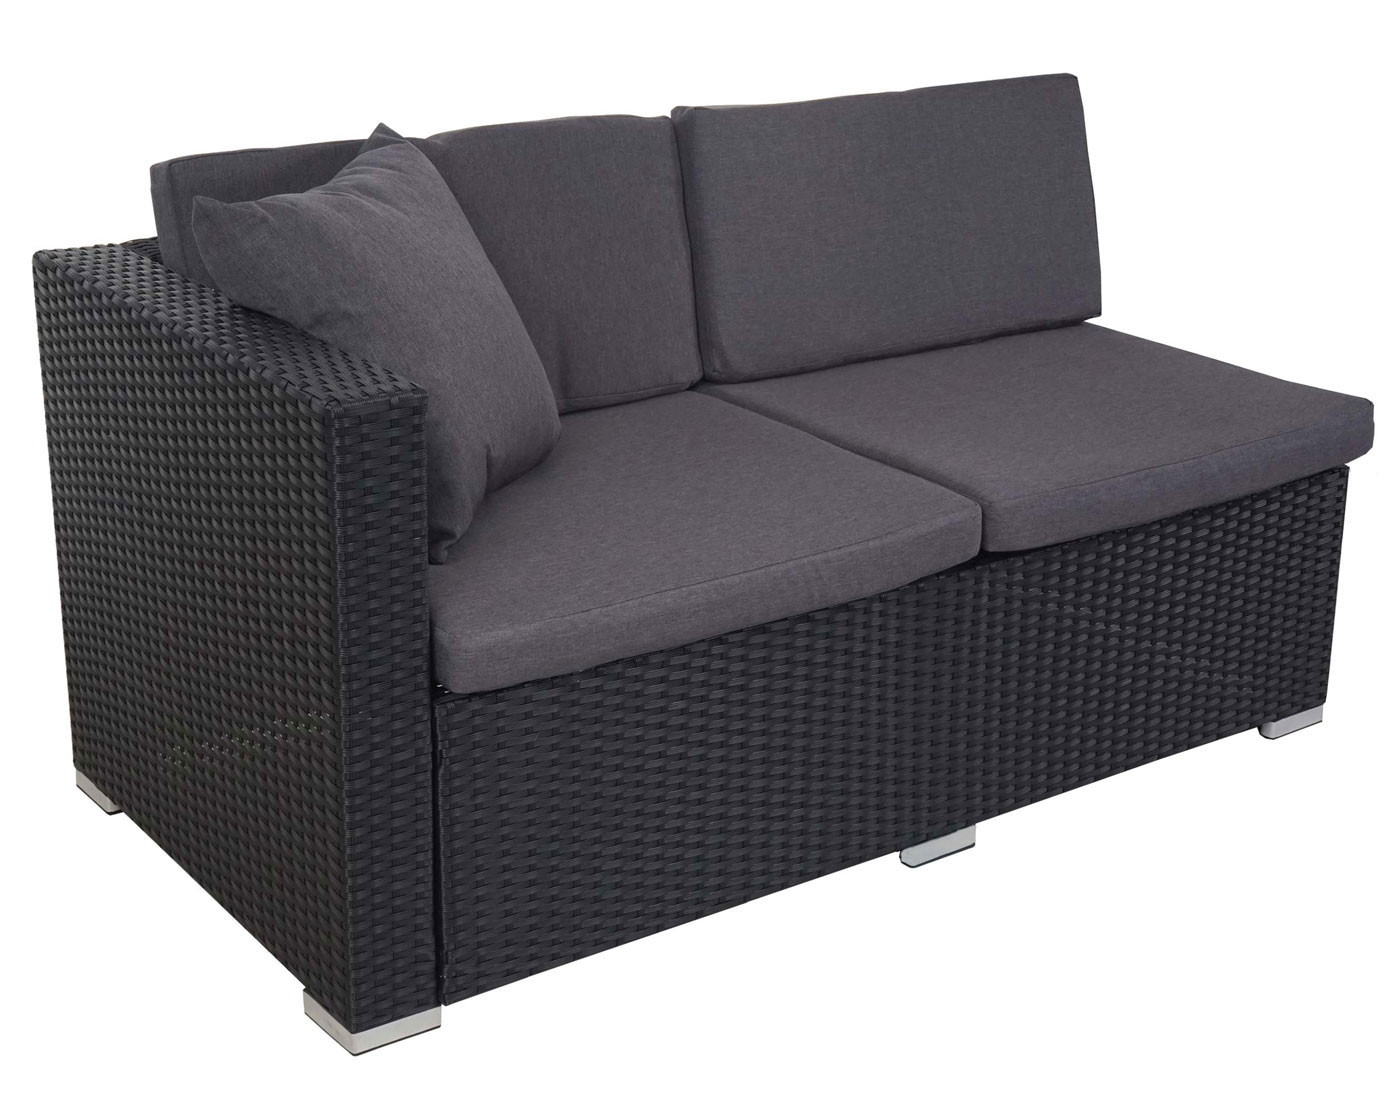 poly rattan sofa garnitur rom basic sitzgruppe lounge set stahl anthrazit kissen anthrazit. Black Bedroom Furniture Sets. Home Design Ideas